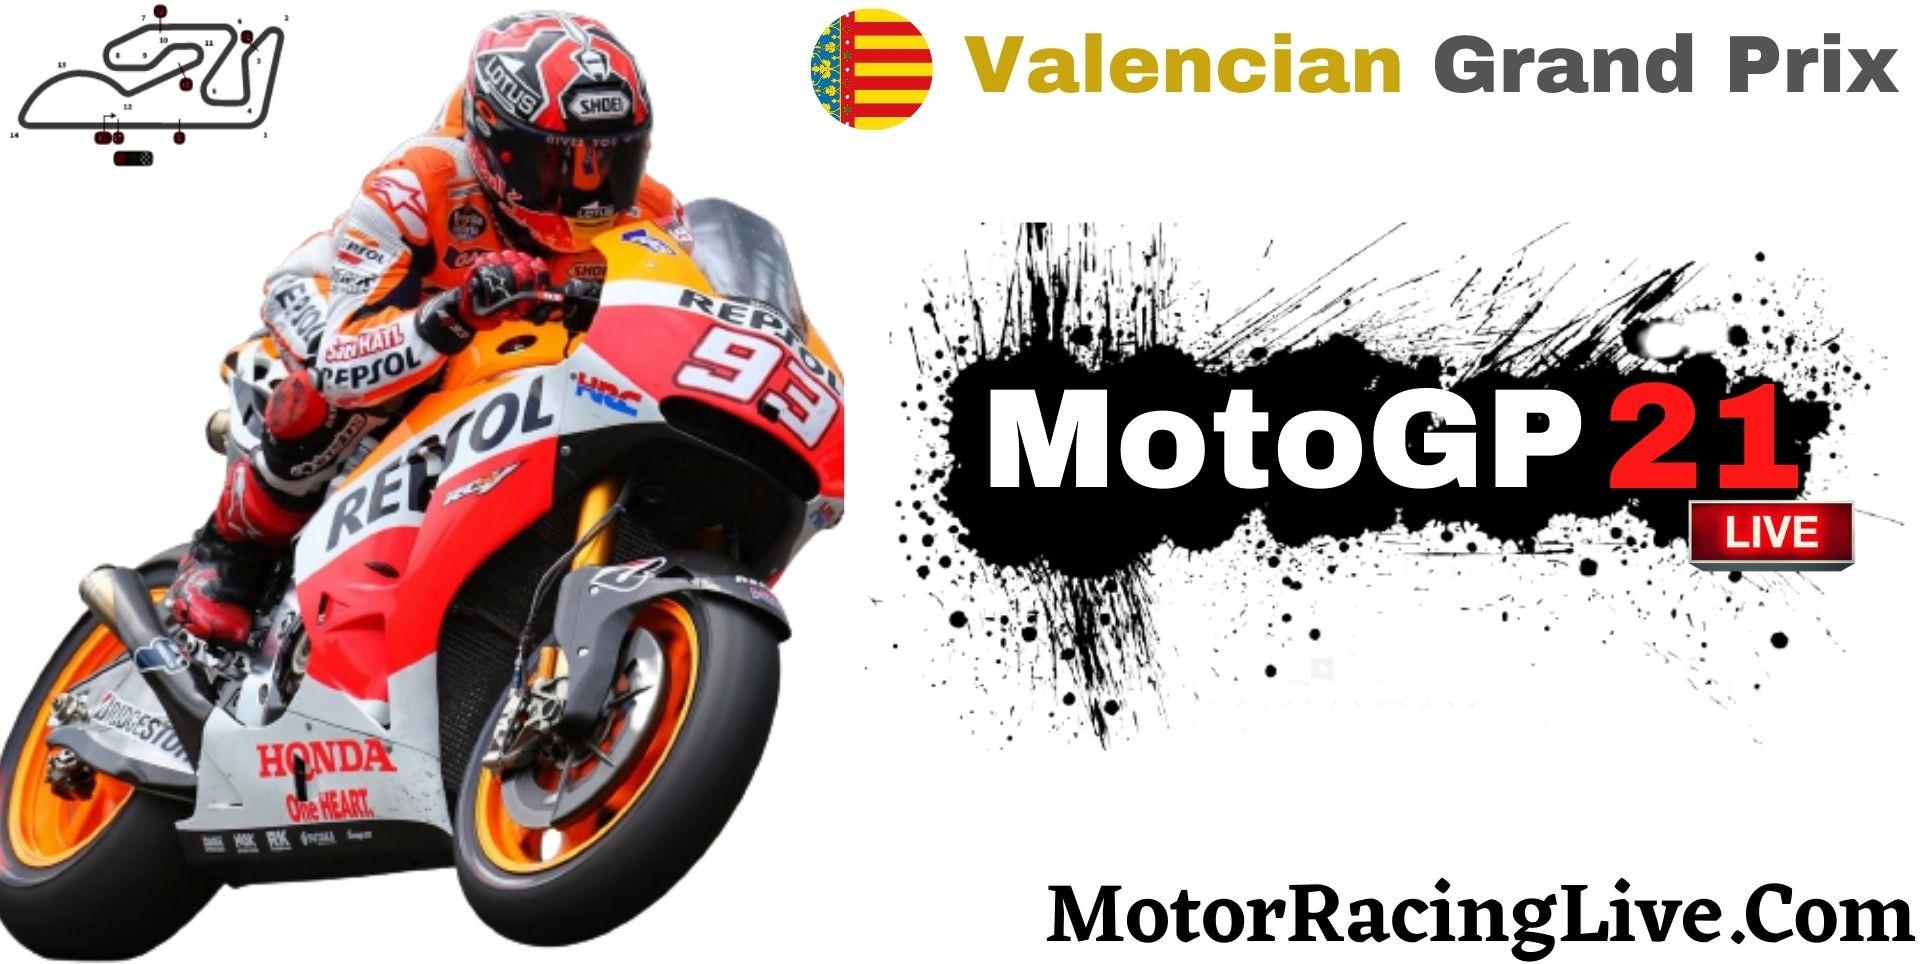 Valenciana Grand Prix MotoGP 2021 Live Stream | Full Race Replay